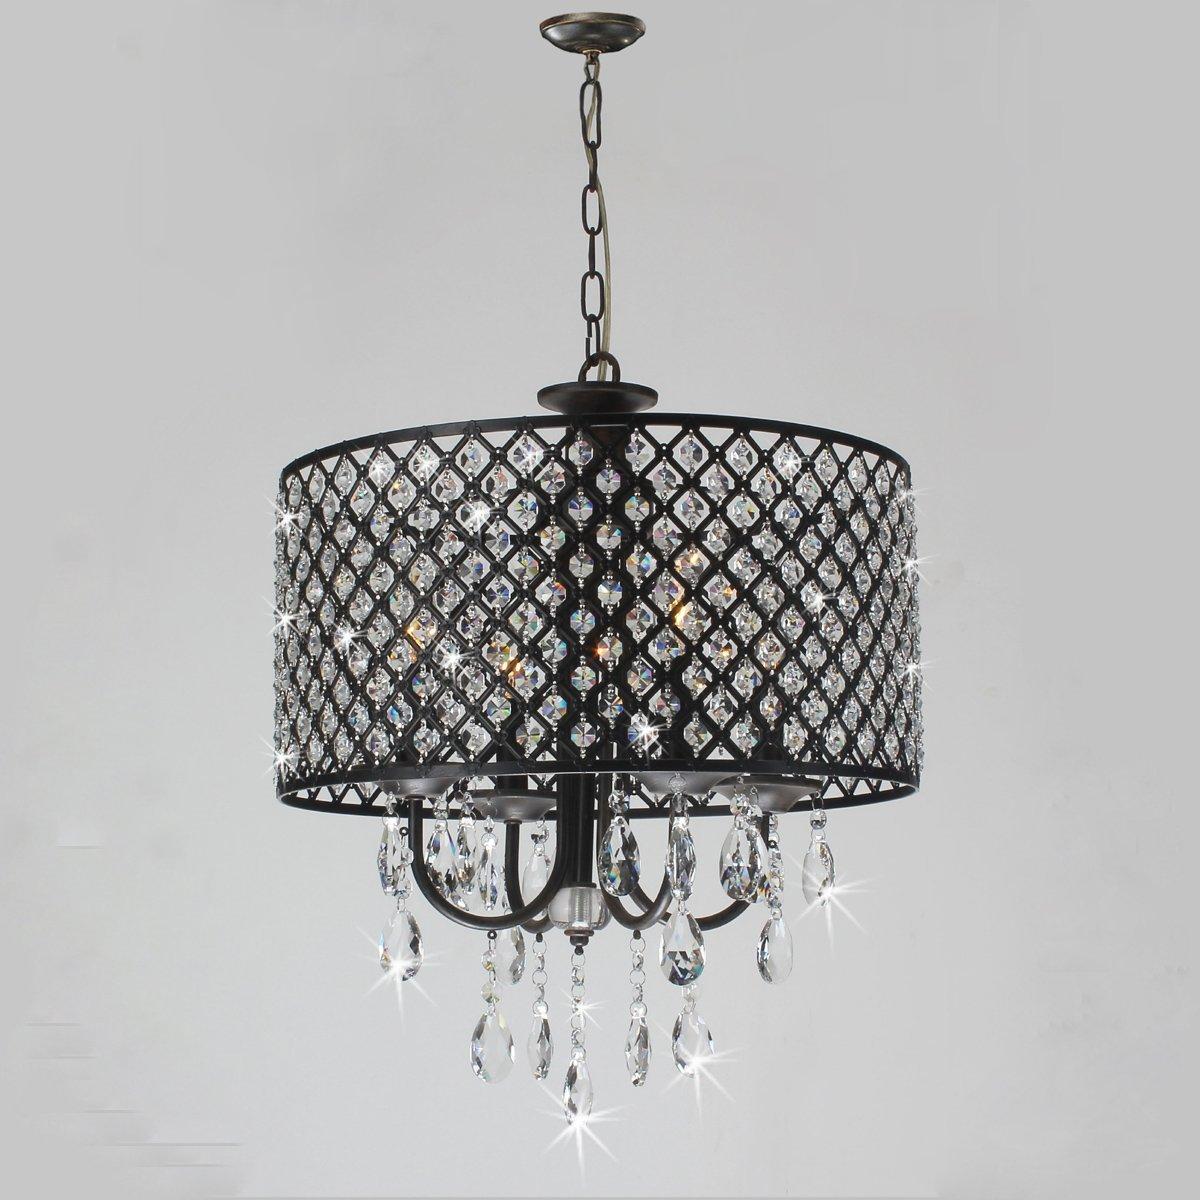 New legend lighting antique black 4 light round crystal chandelier new legend lighting antique black 4 light round crystal chandelier pendant ceiling fixture amazon aloadofball Gallery